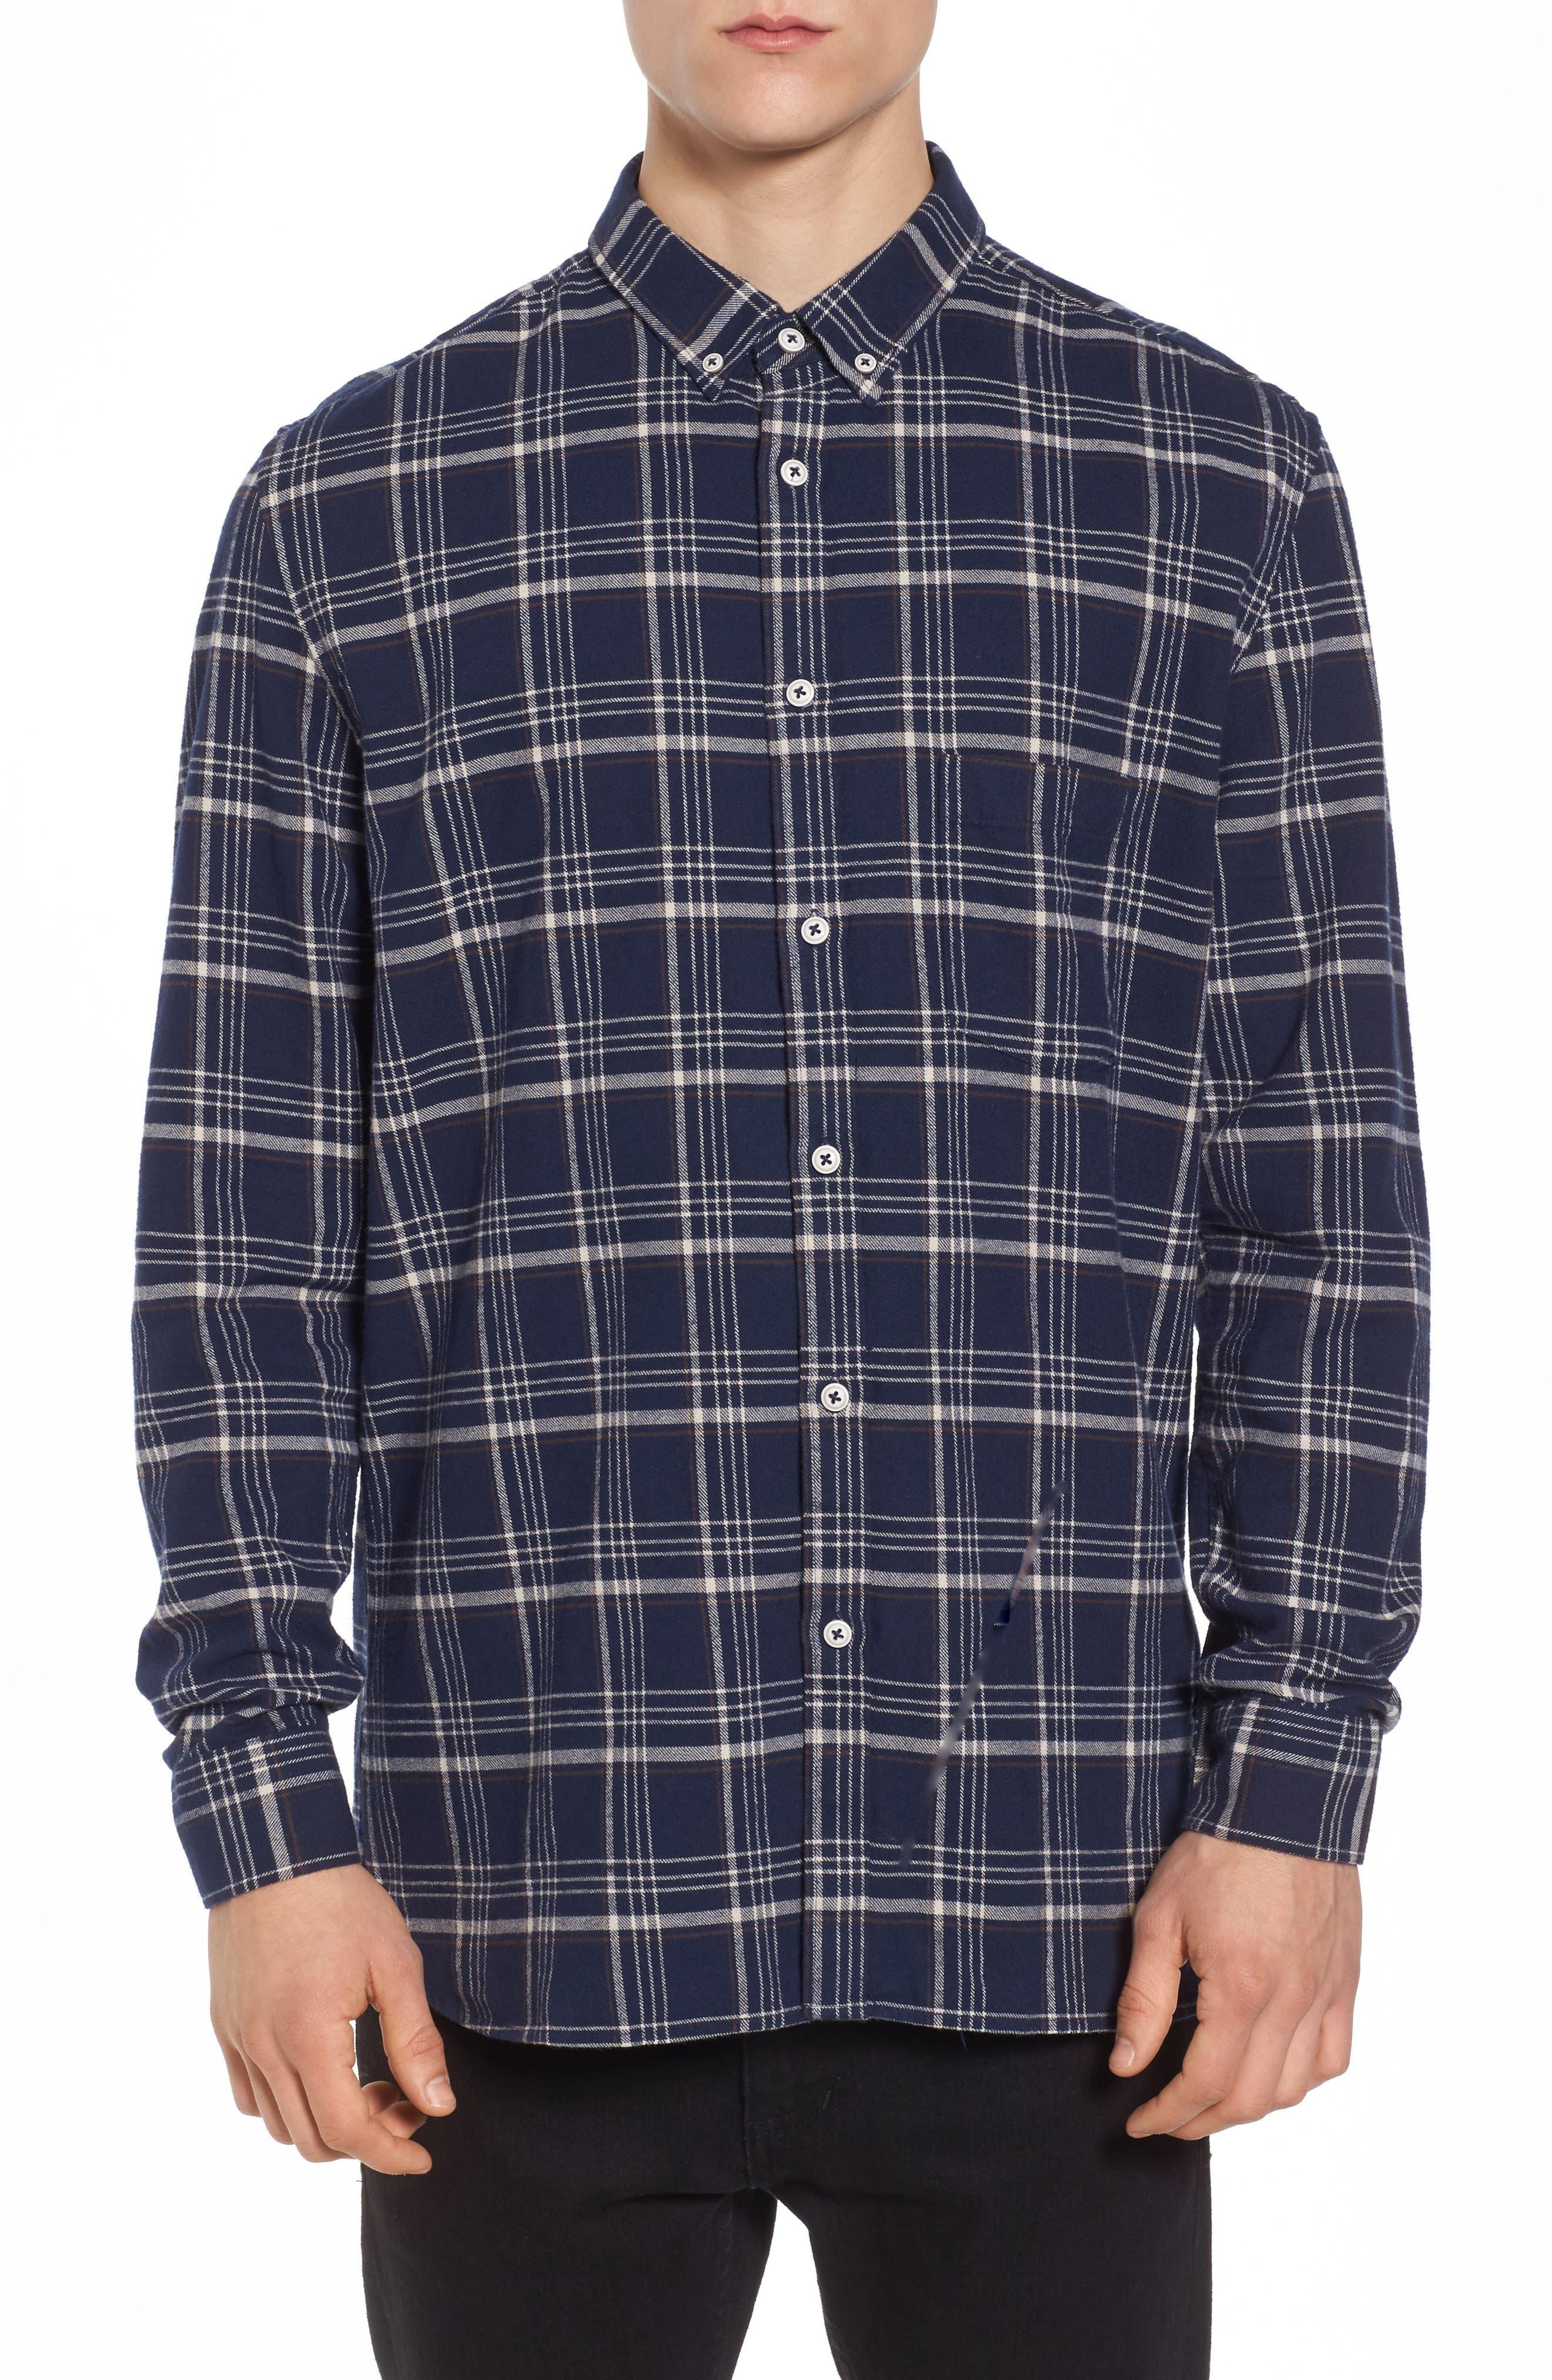 Alternate Image 1 Selected - Barney Cools Cabin Plaid Shirt